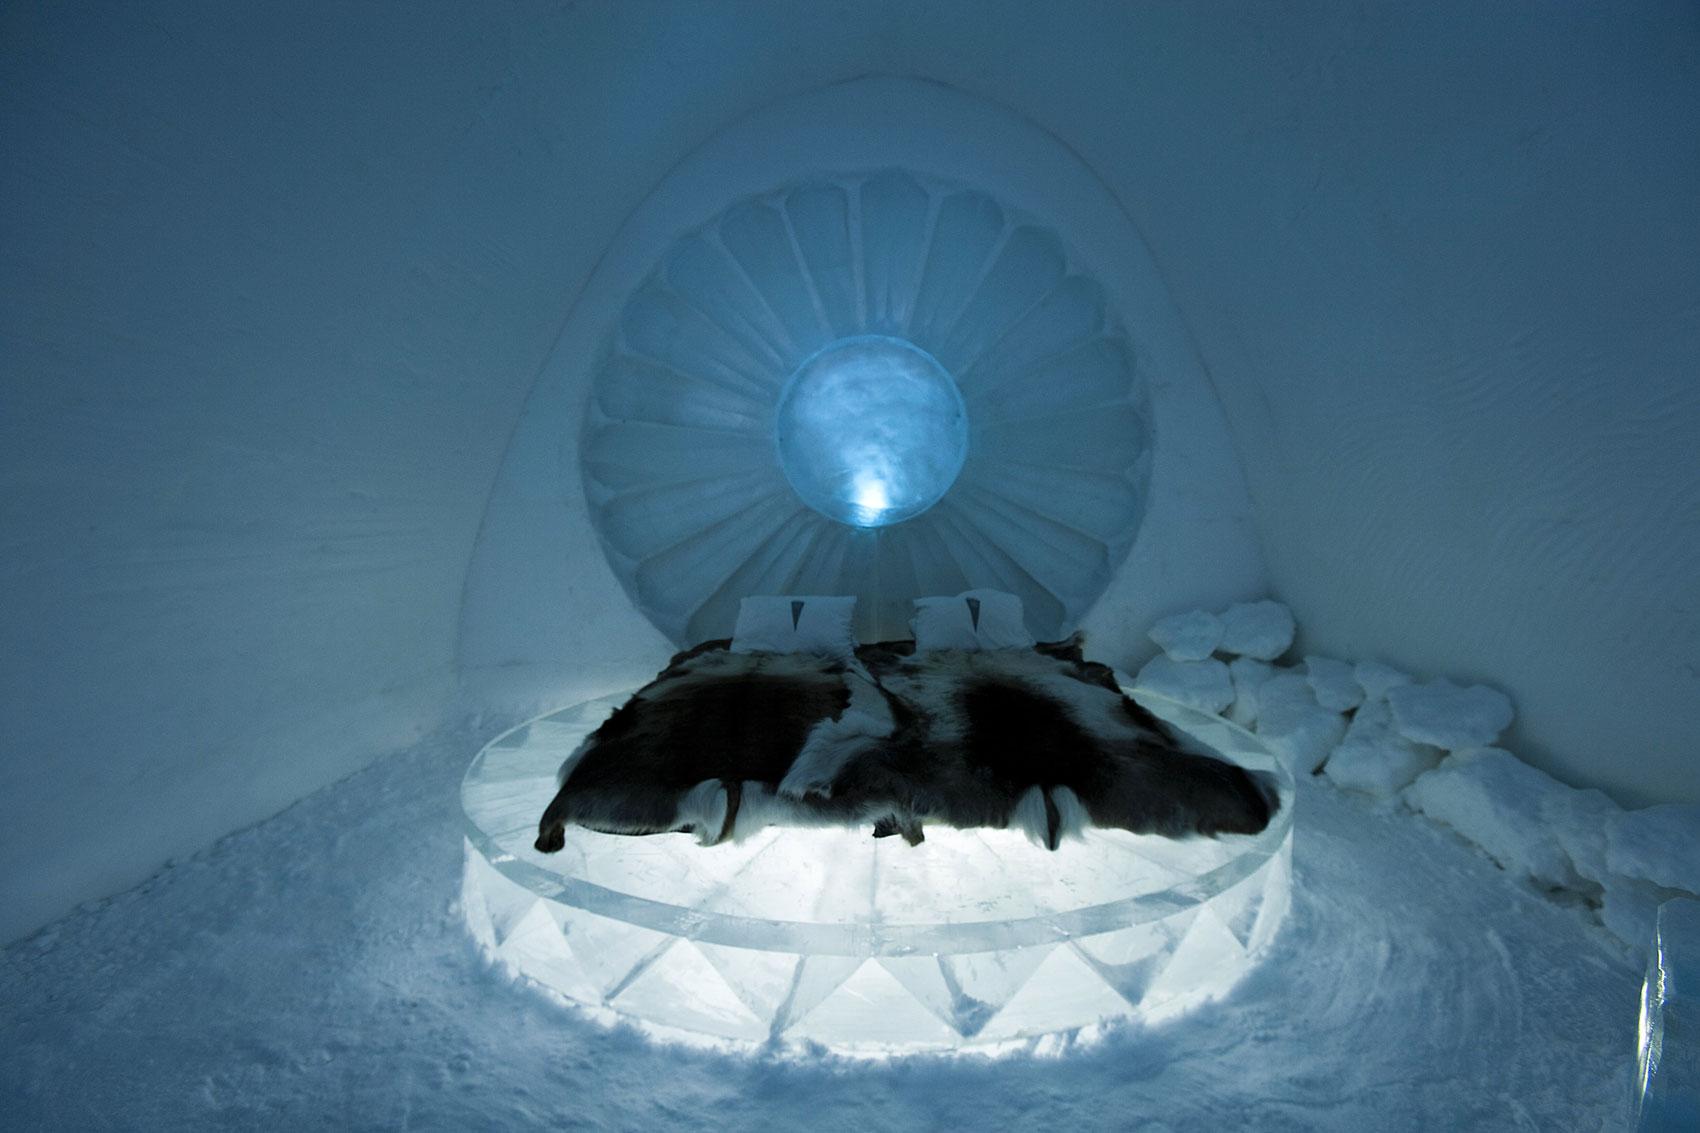 Icehotel in jukkasjarvi sweden 5